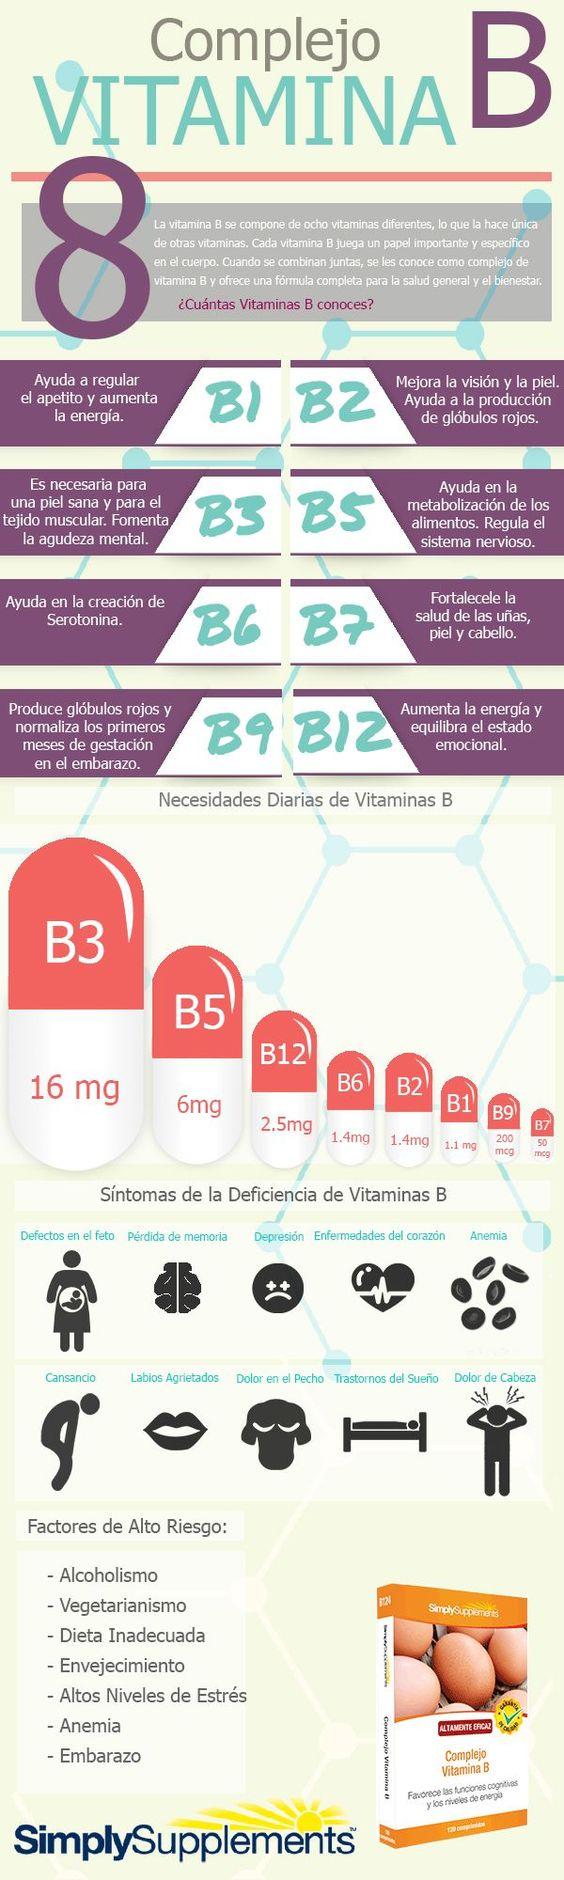 tipos de vitamina B